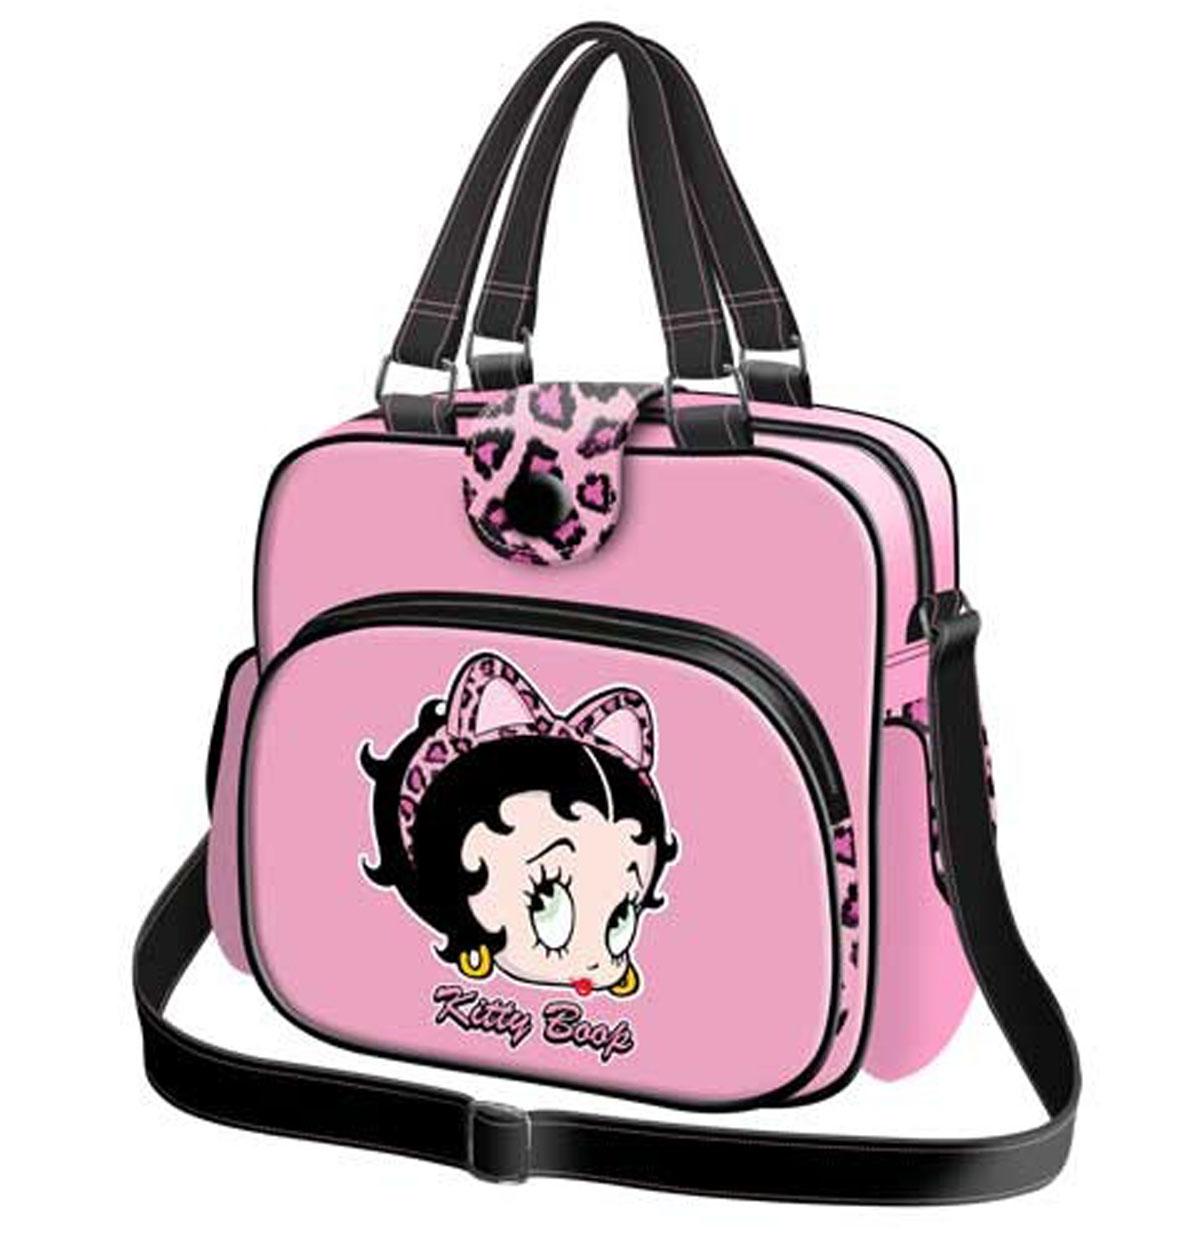 Betty Boop Kitty Boop handbag